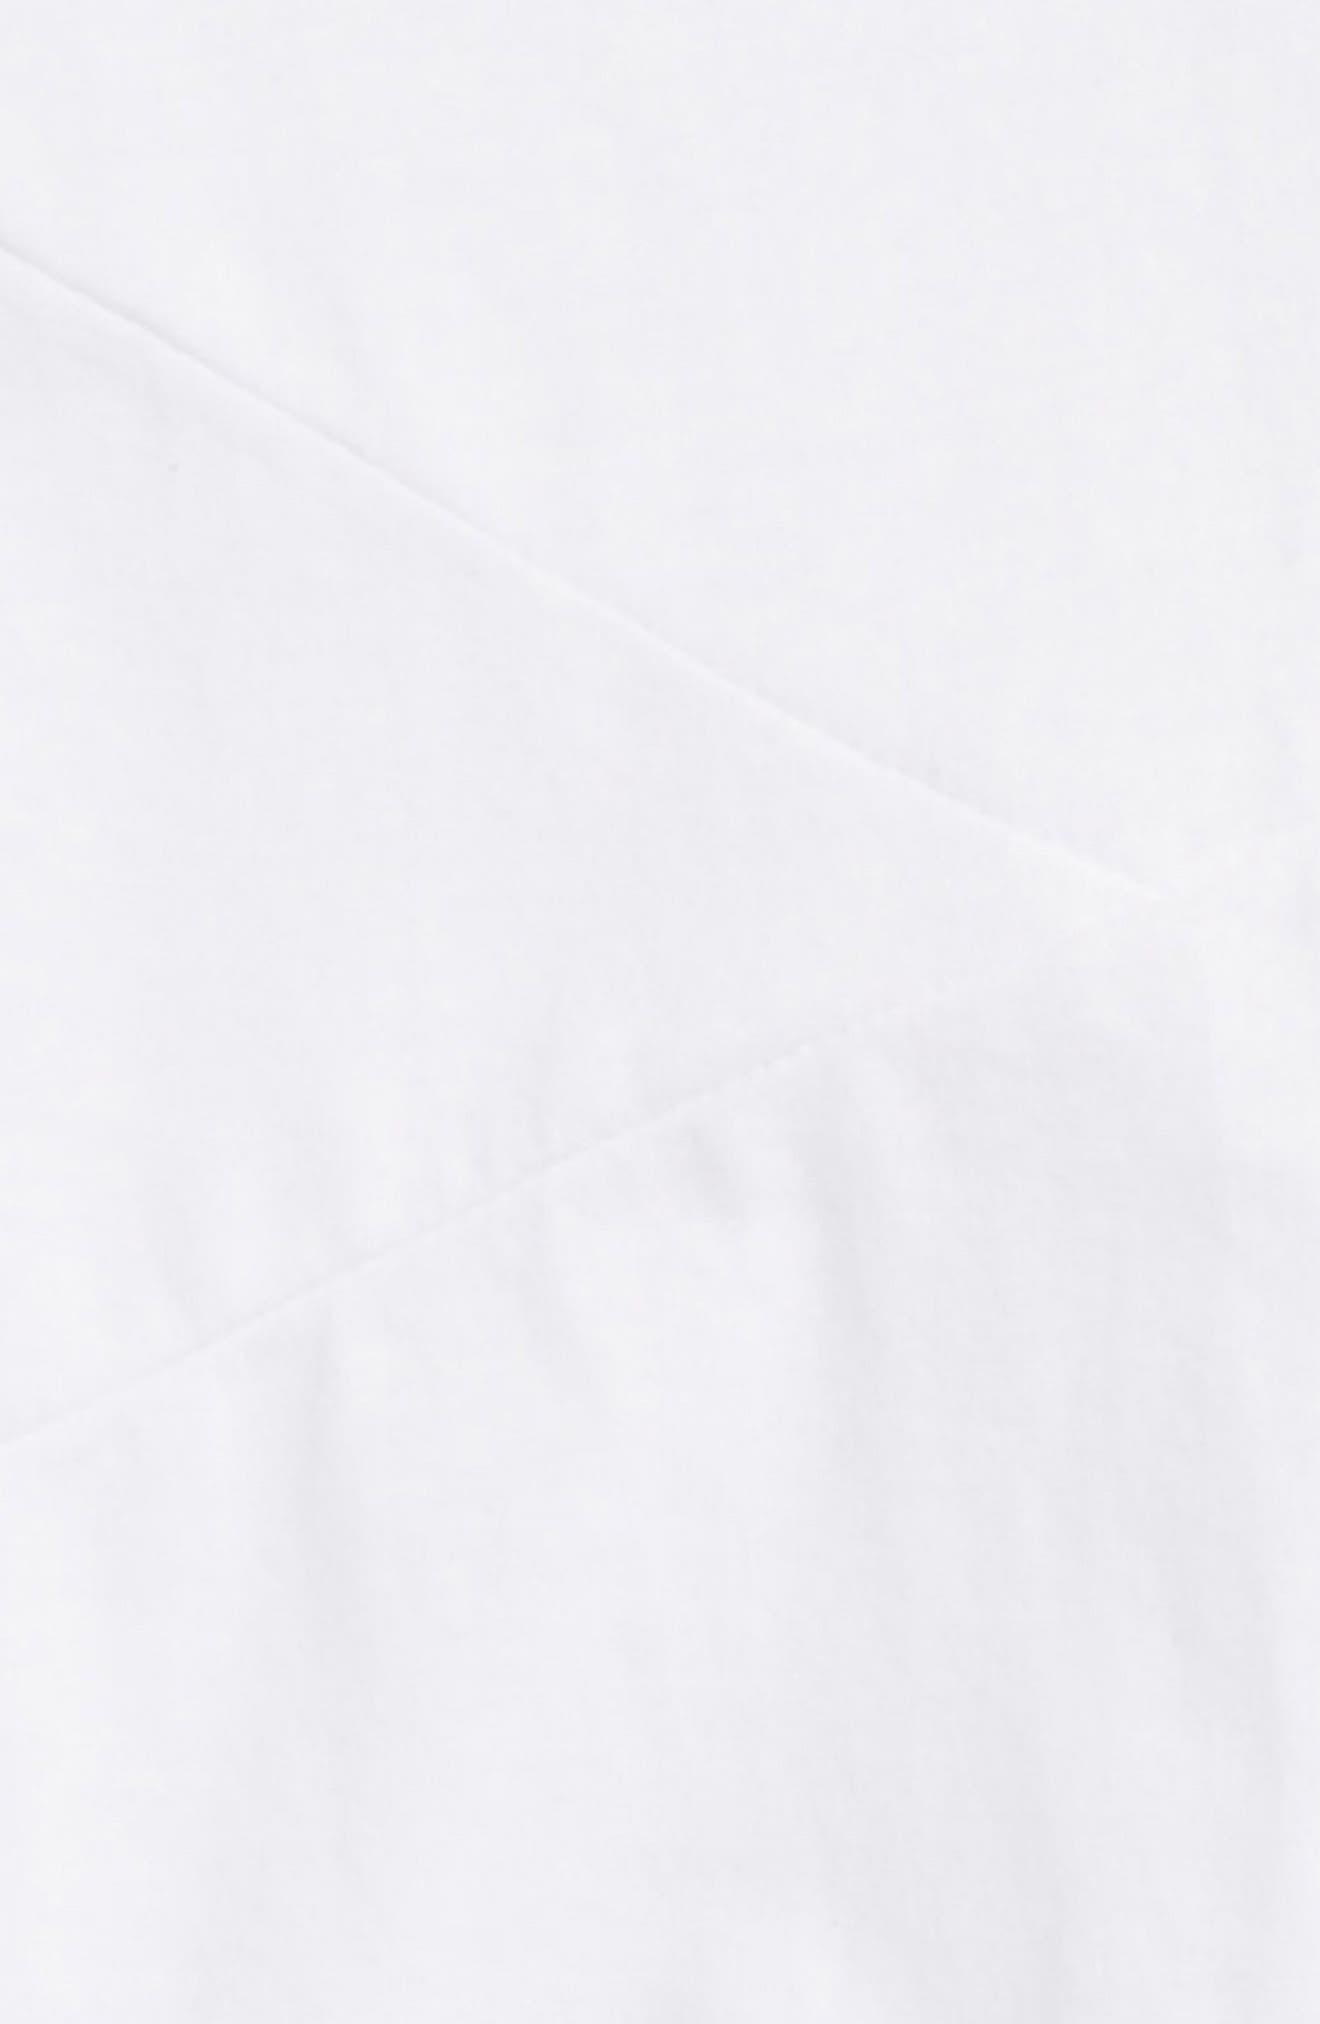 Alternate Image 2  - Kidding Around T-Shirt & Shorts Set (Baby)